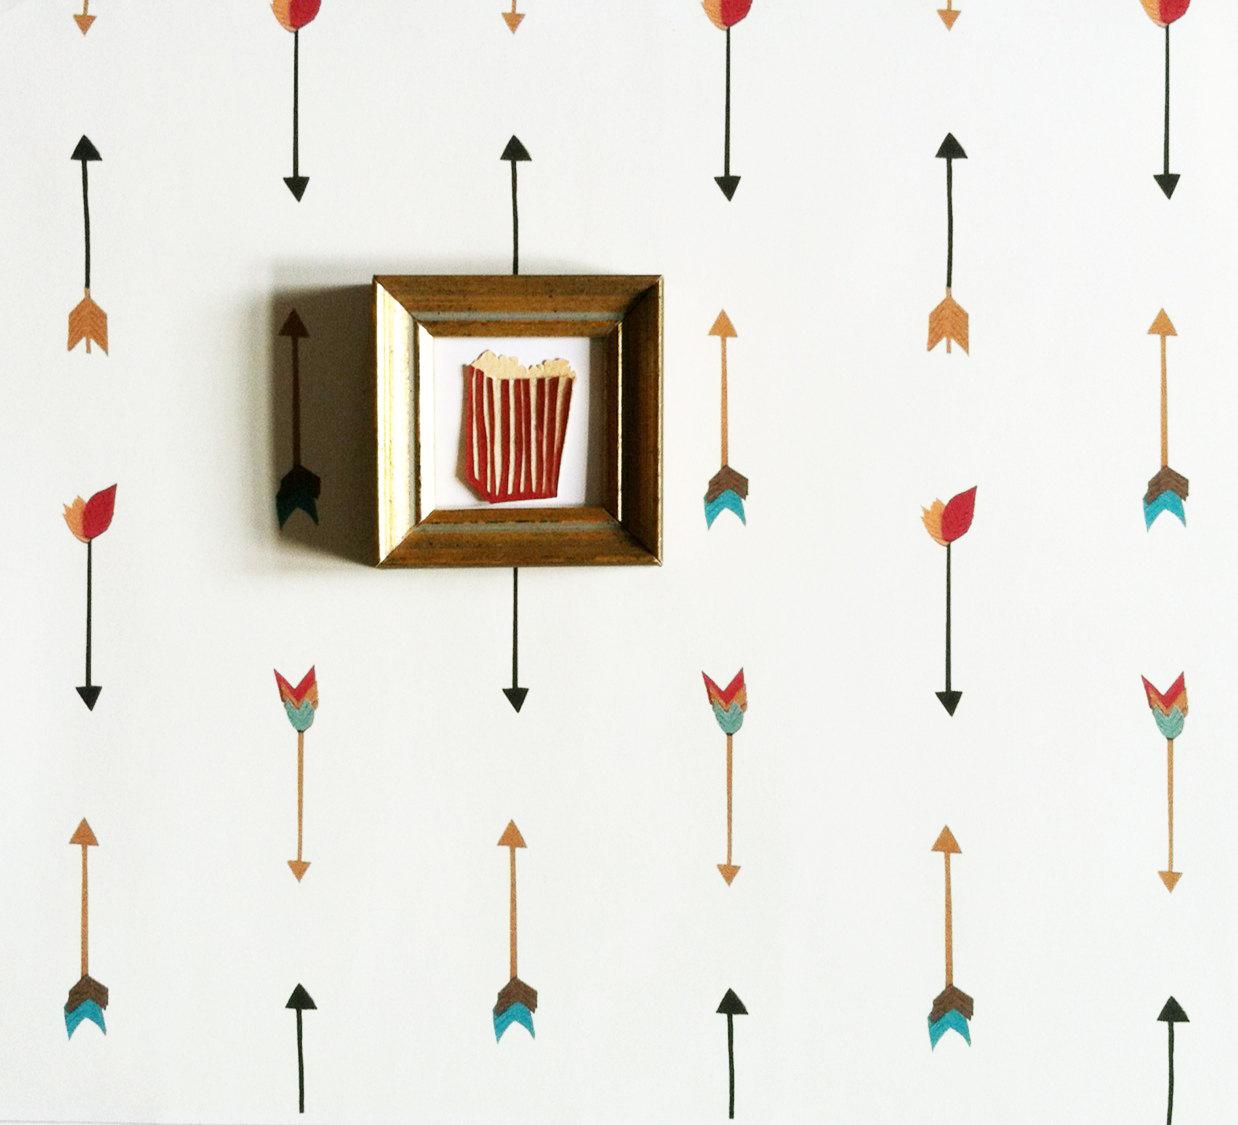 Removable Wallpaper Multi Color Arrow by KateZarembaCompany 1238x1125